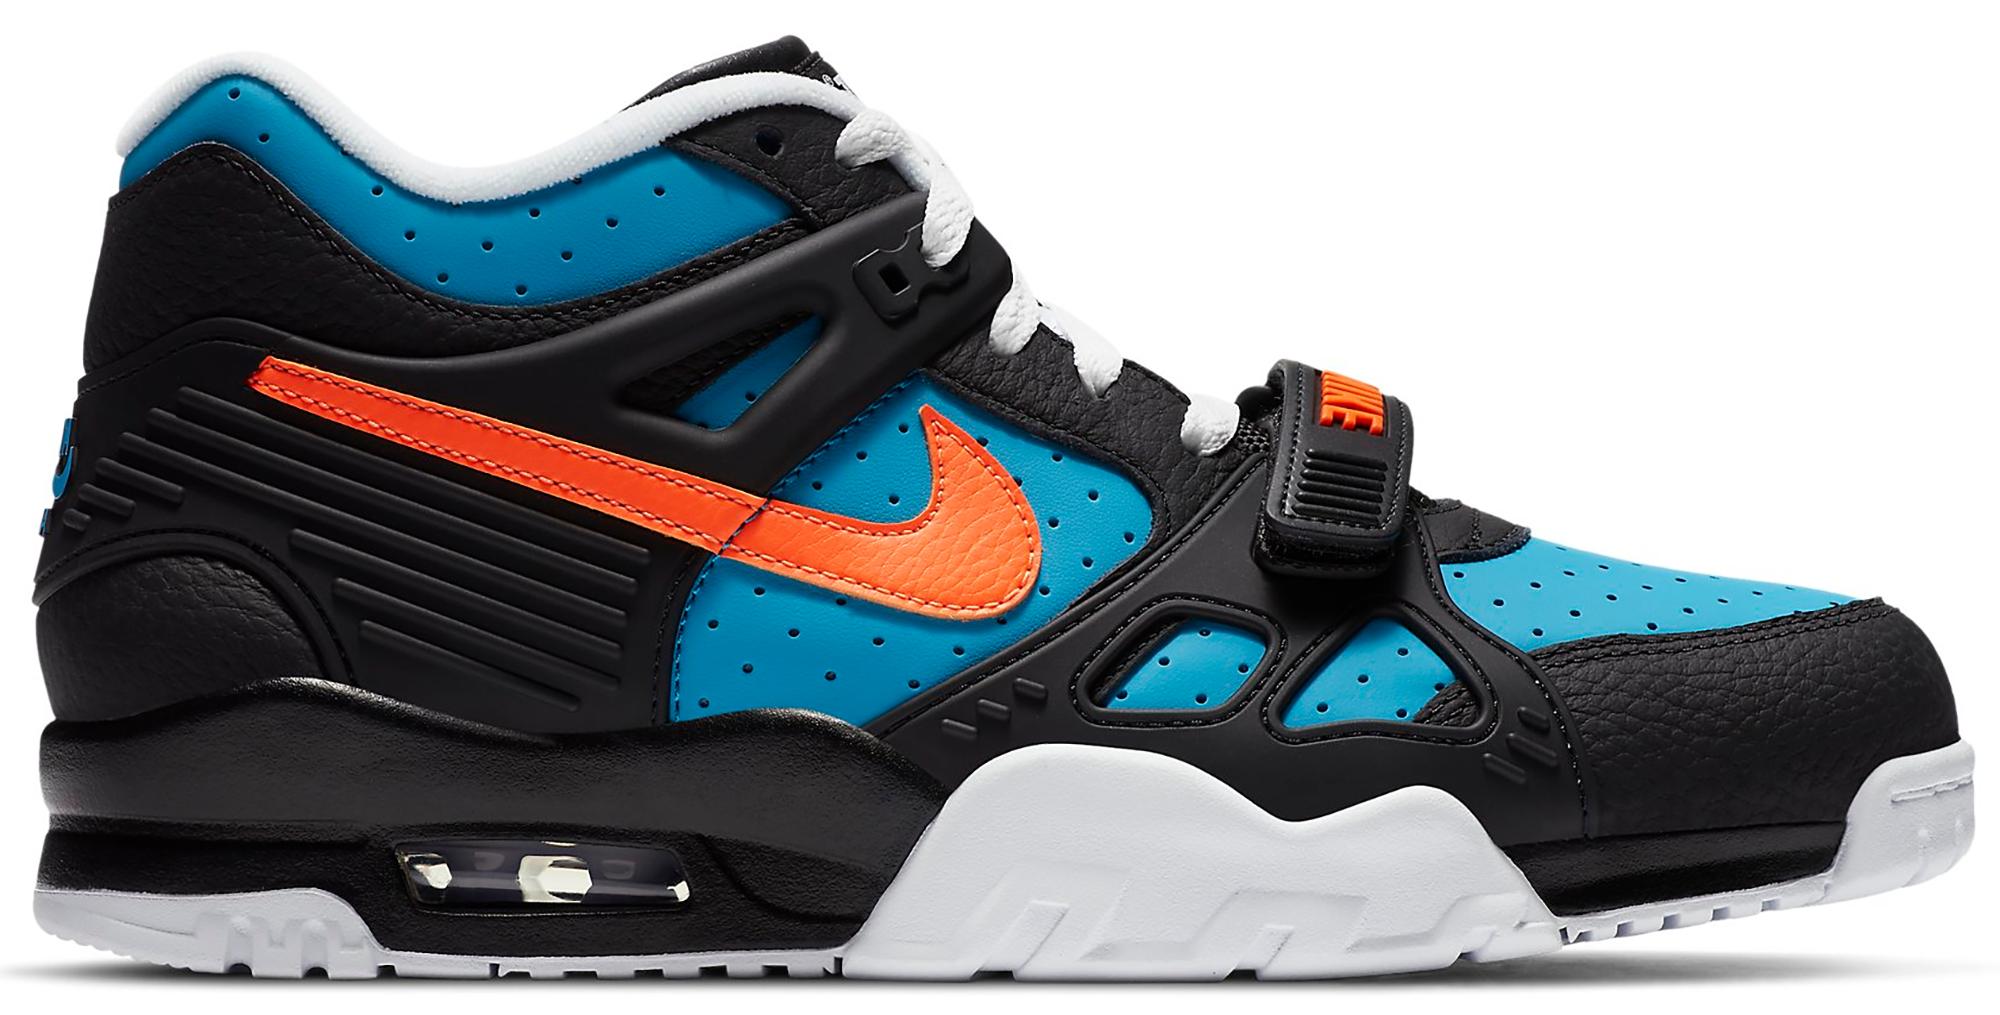 Nike Air Trainer 3 Black Total Orange